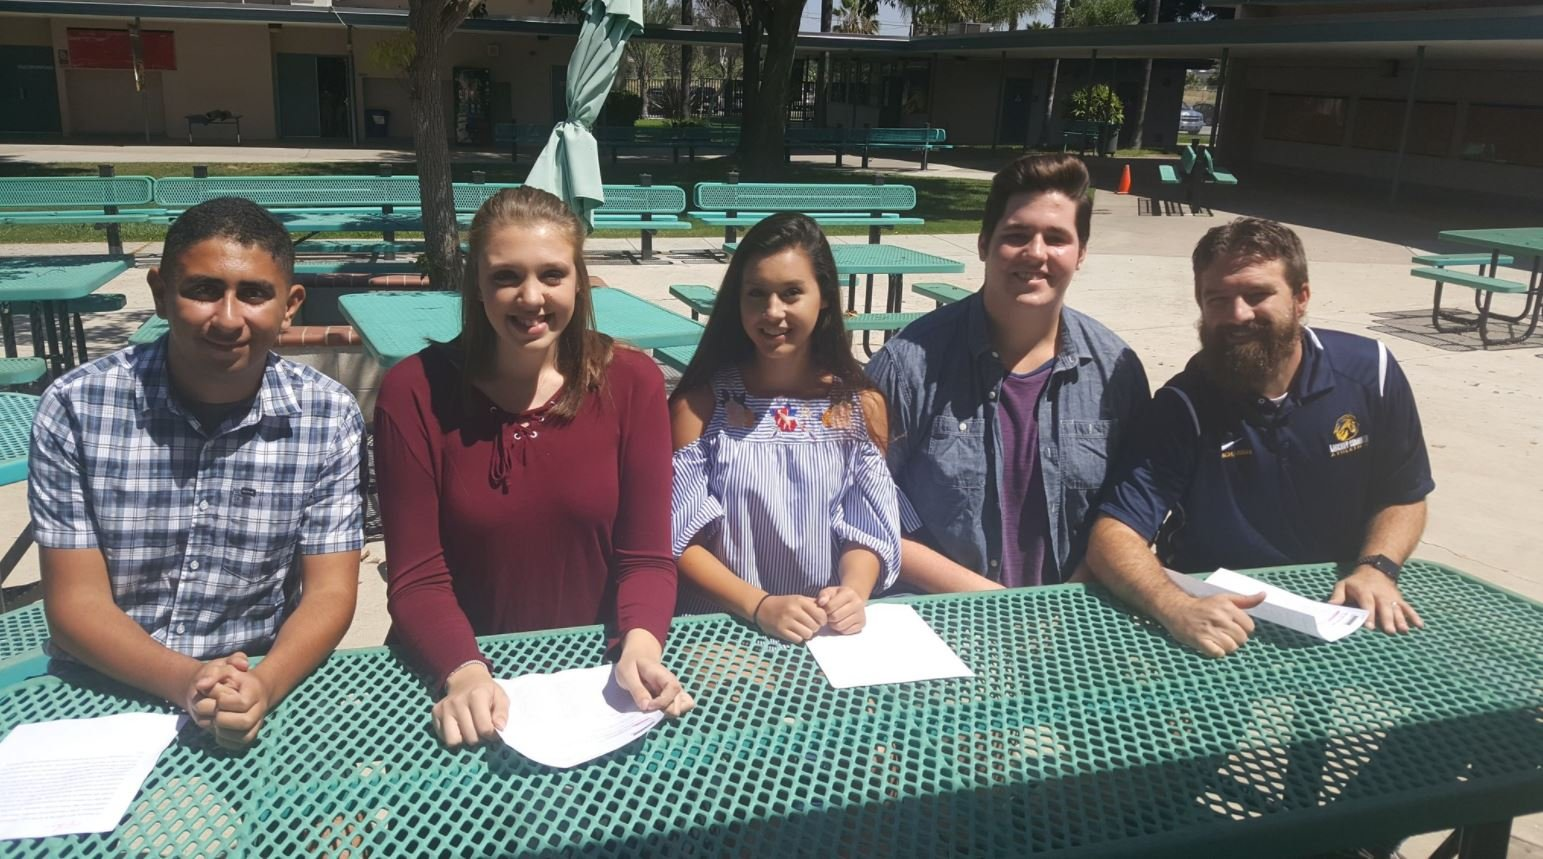 Ethan Rosado, Ashley Gall, Jessica Salvador and Jarred Botha